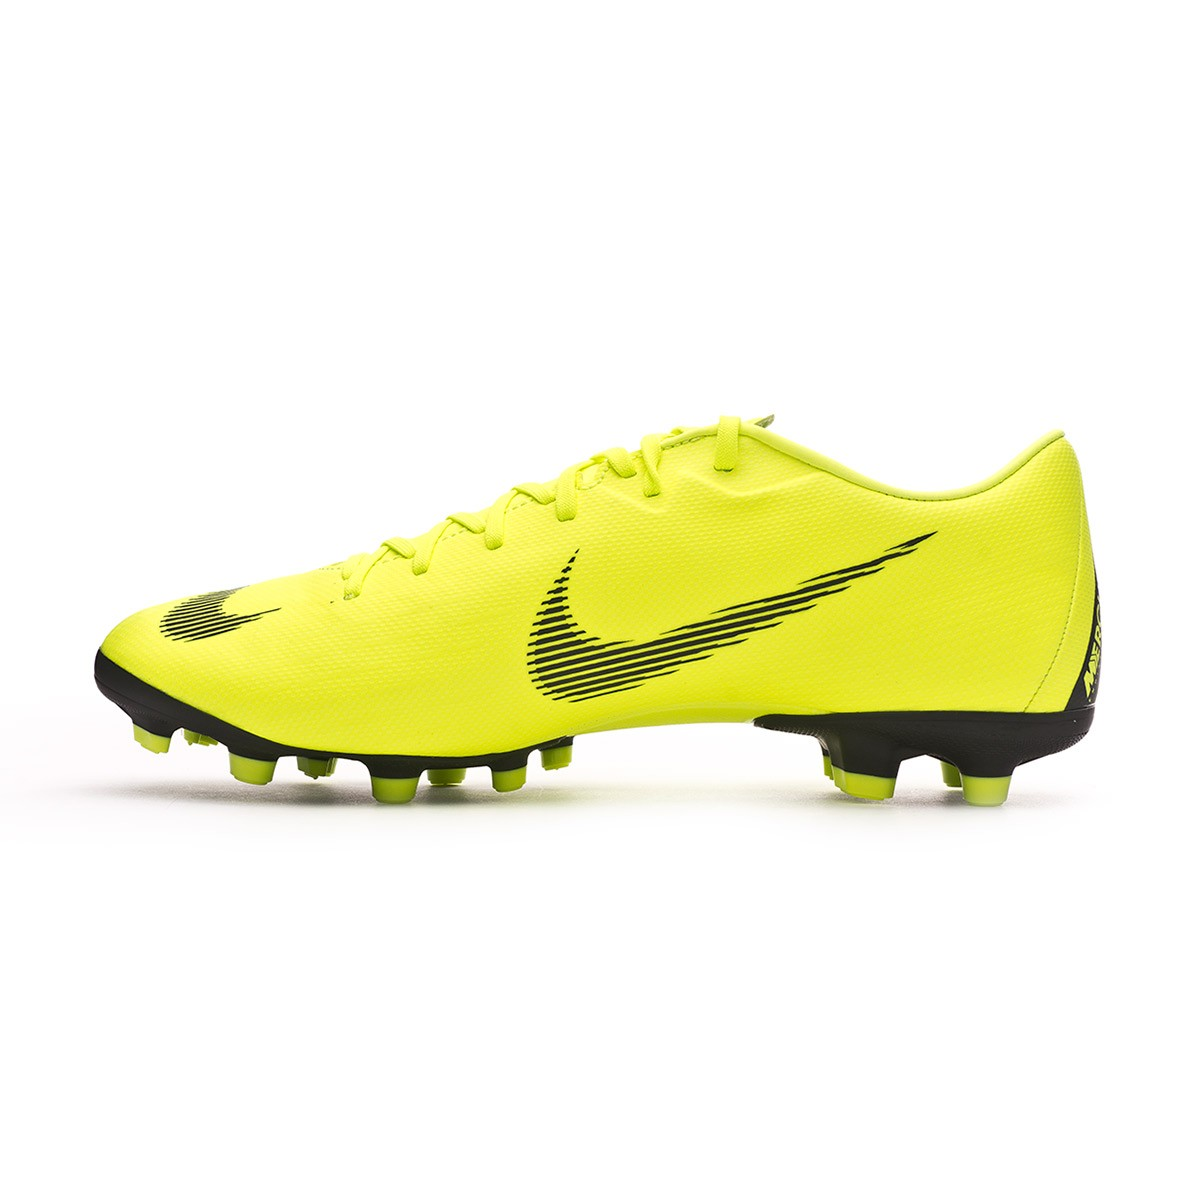 90fc496a2c4c Football Boots Nike Mercurial Vapor XII Academy MG Volt-Black - Tienda de  fútbol Fútbol Emotion